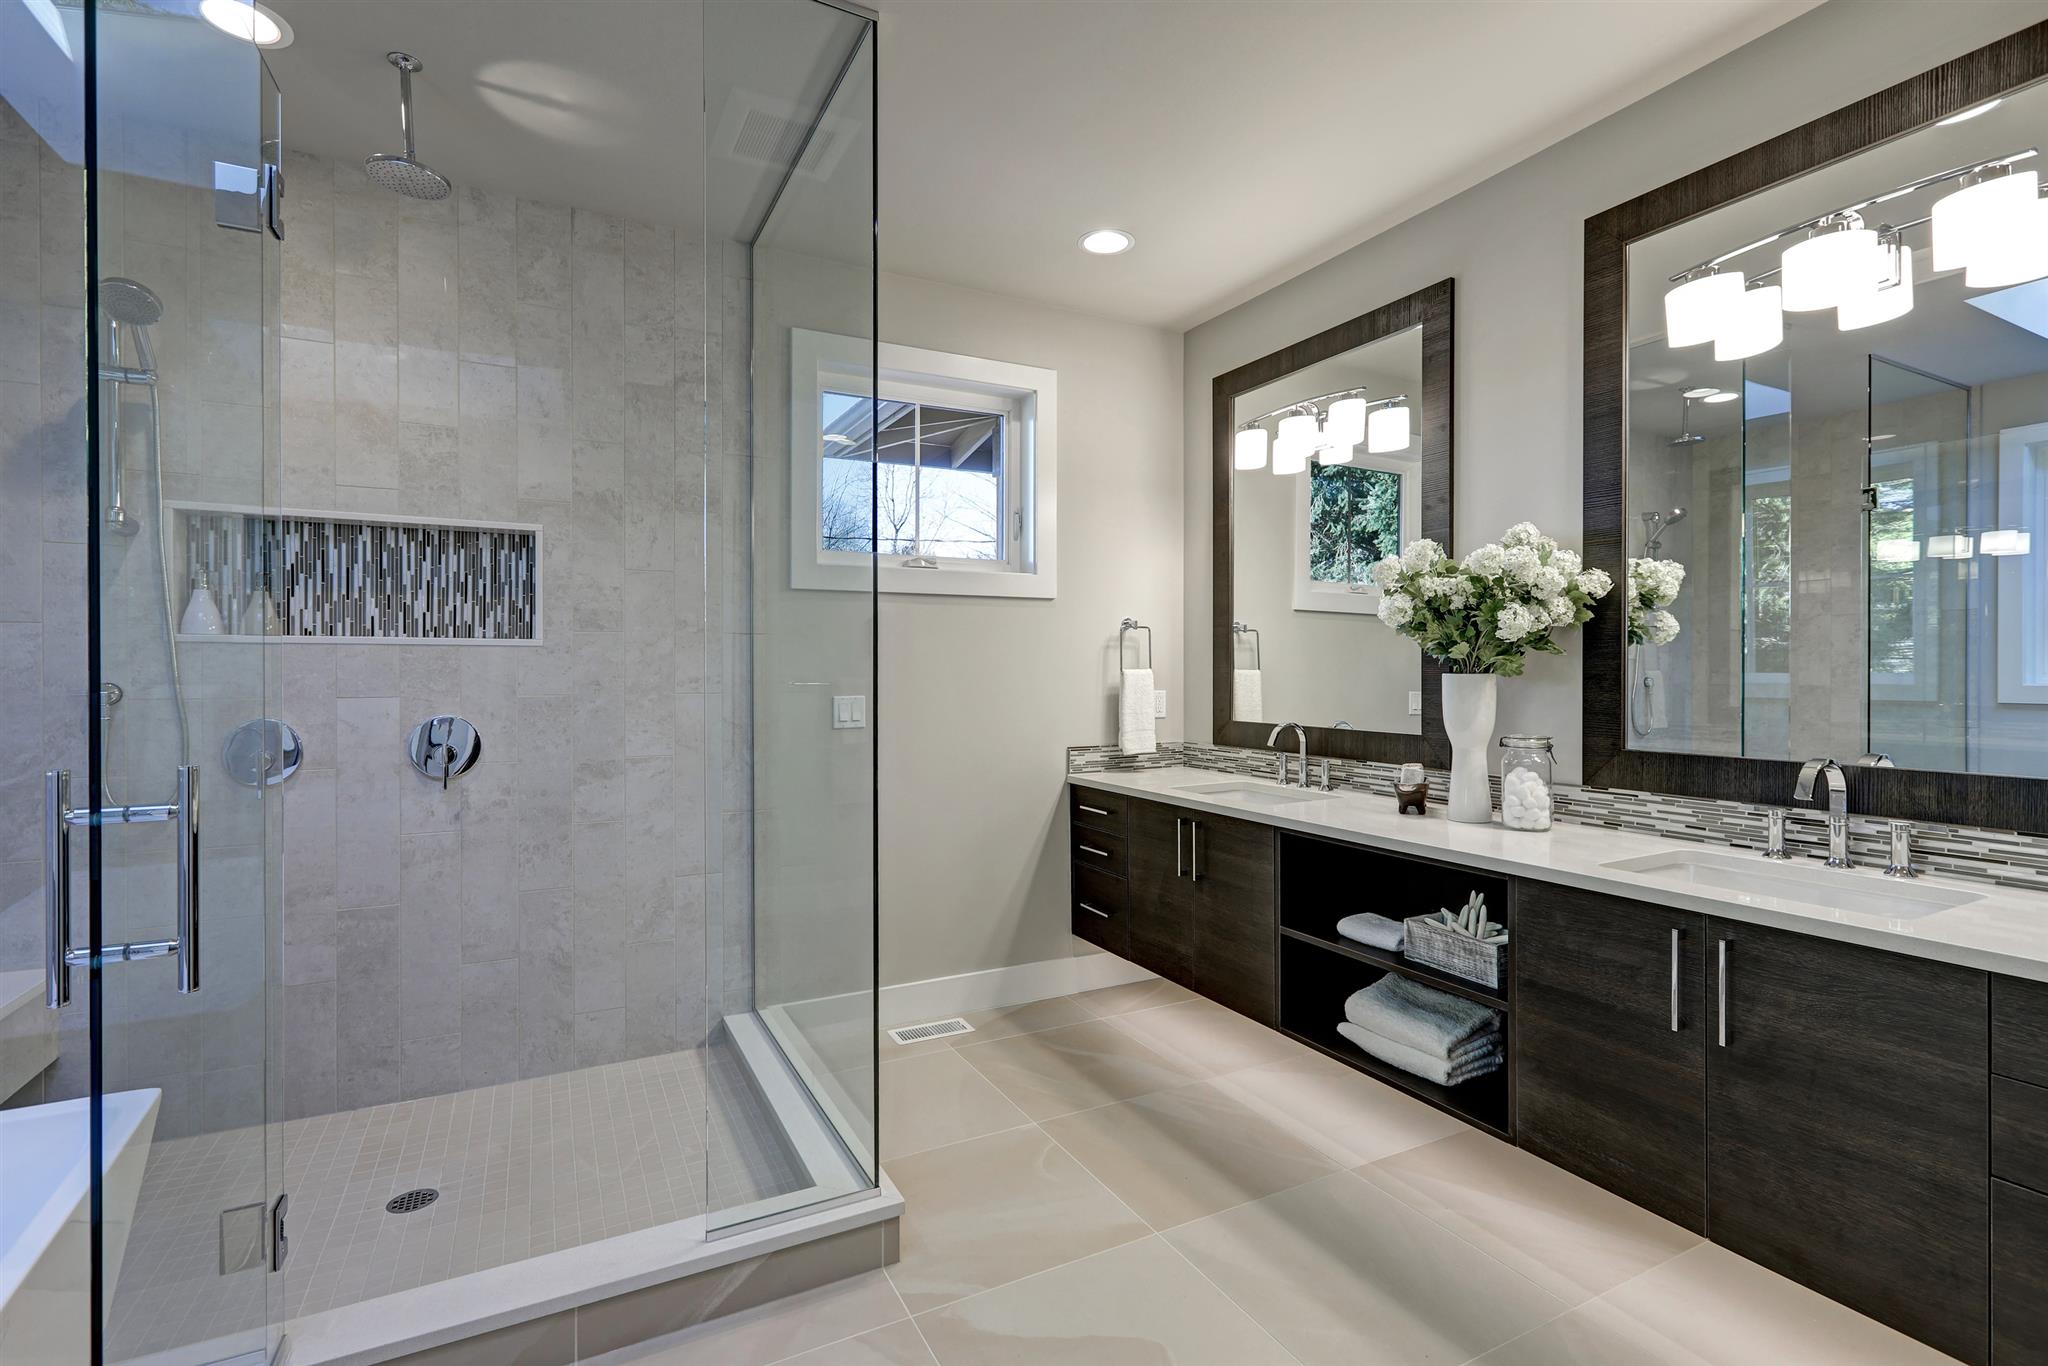 bigstock Spacious Bathroom In Gray Tone